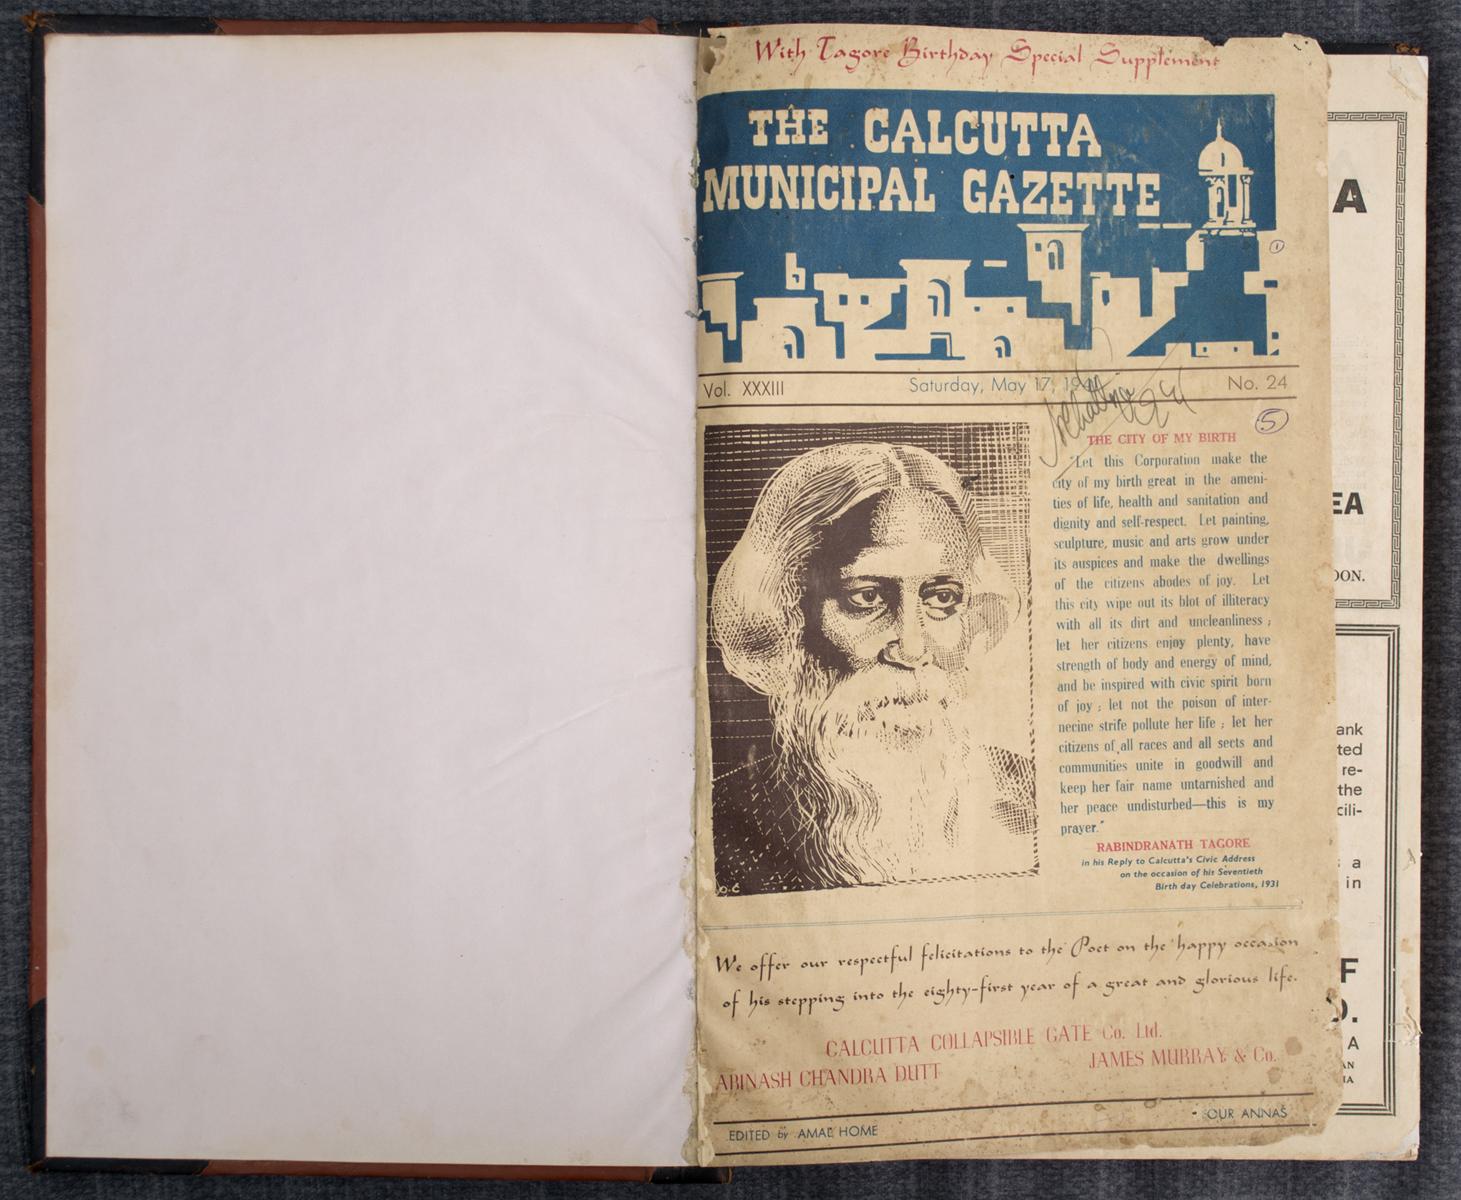 The Calcutta Municipal Gazette: Tagore Birthday Special Supplement